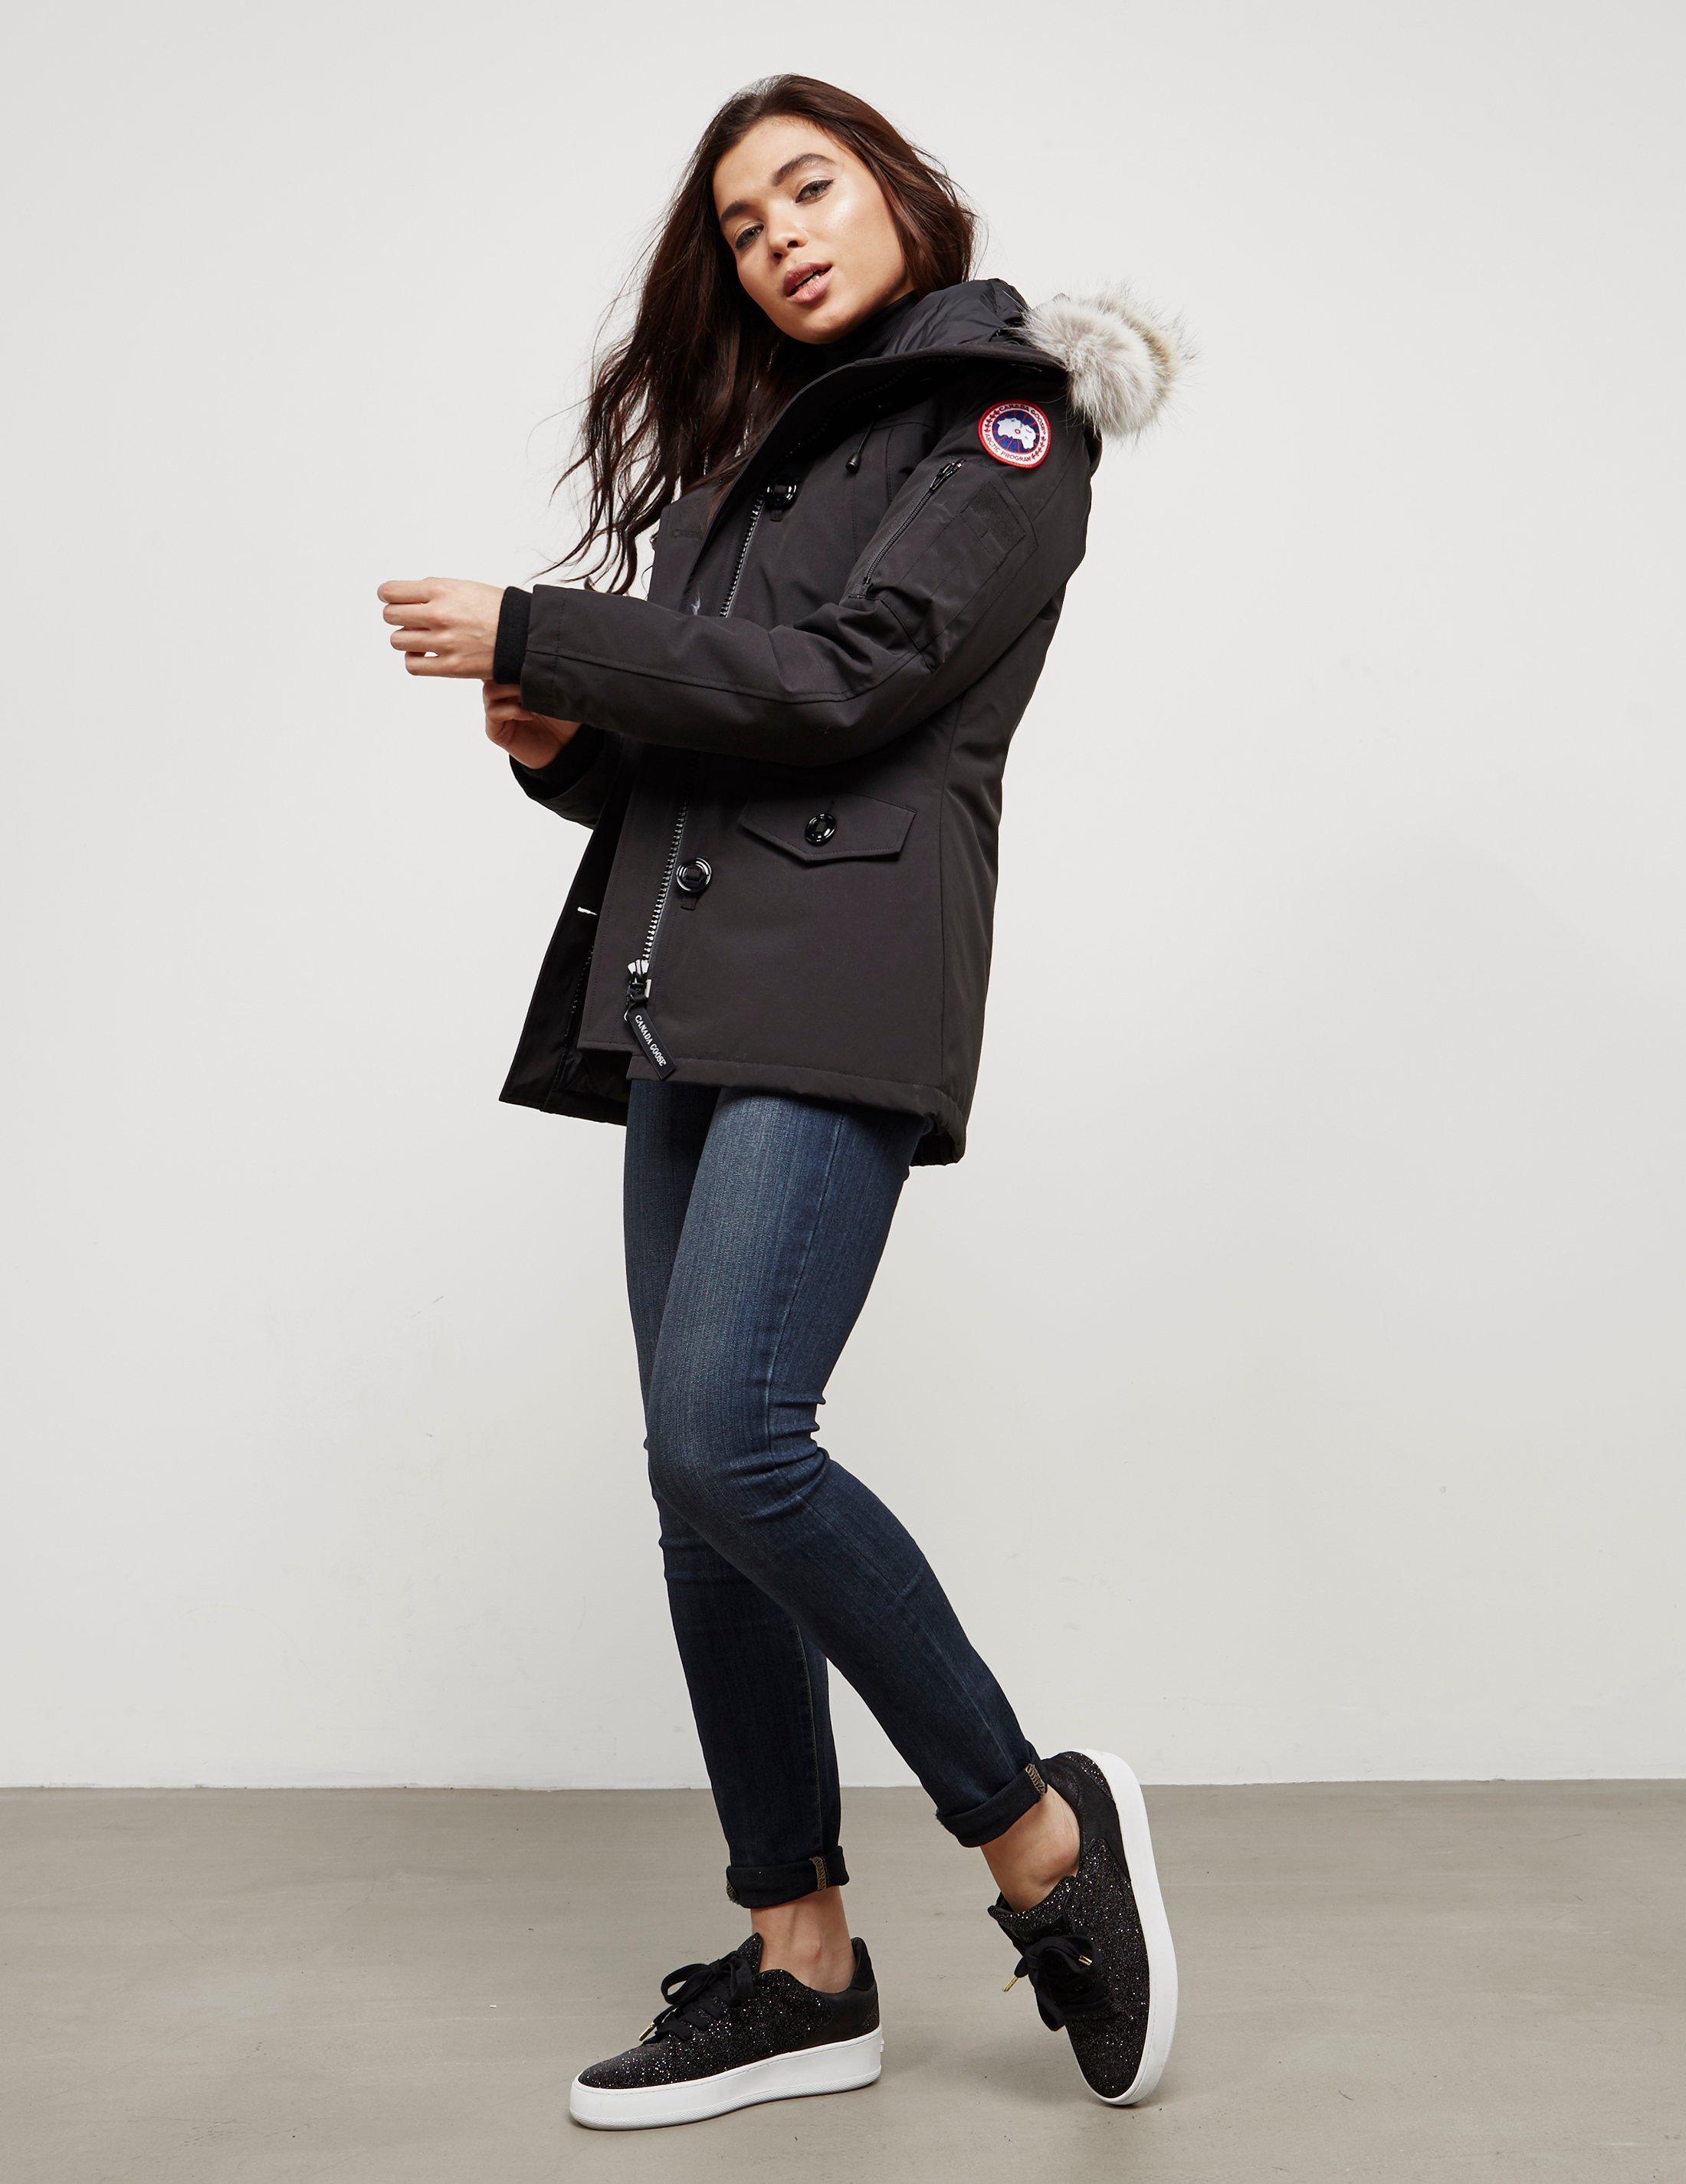 ff0906a6676 Canada Goose Montebello Parka Jacket in Black - Lyst